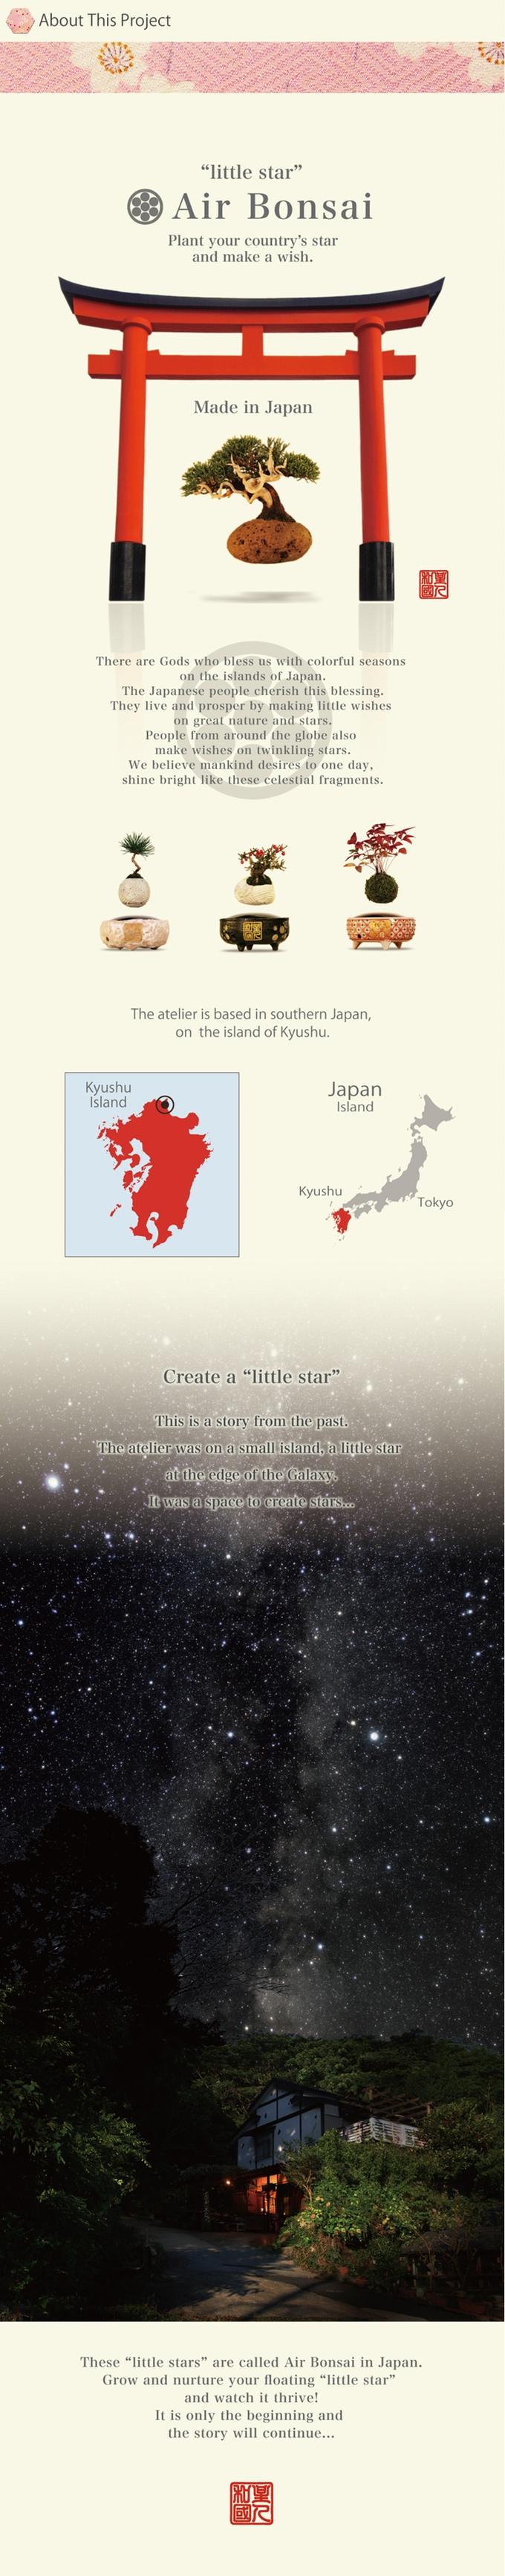 Air Bonsai is a floating star How